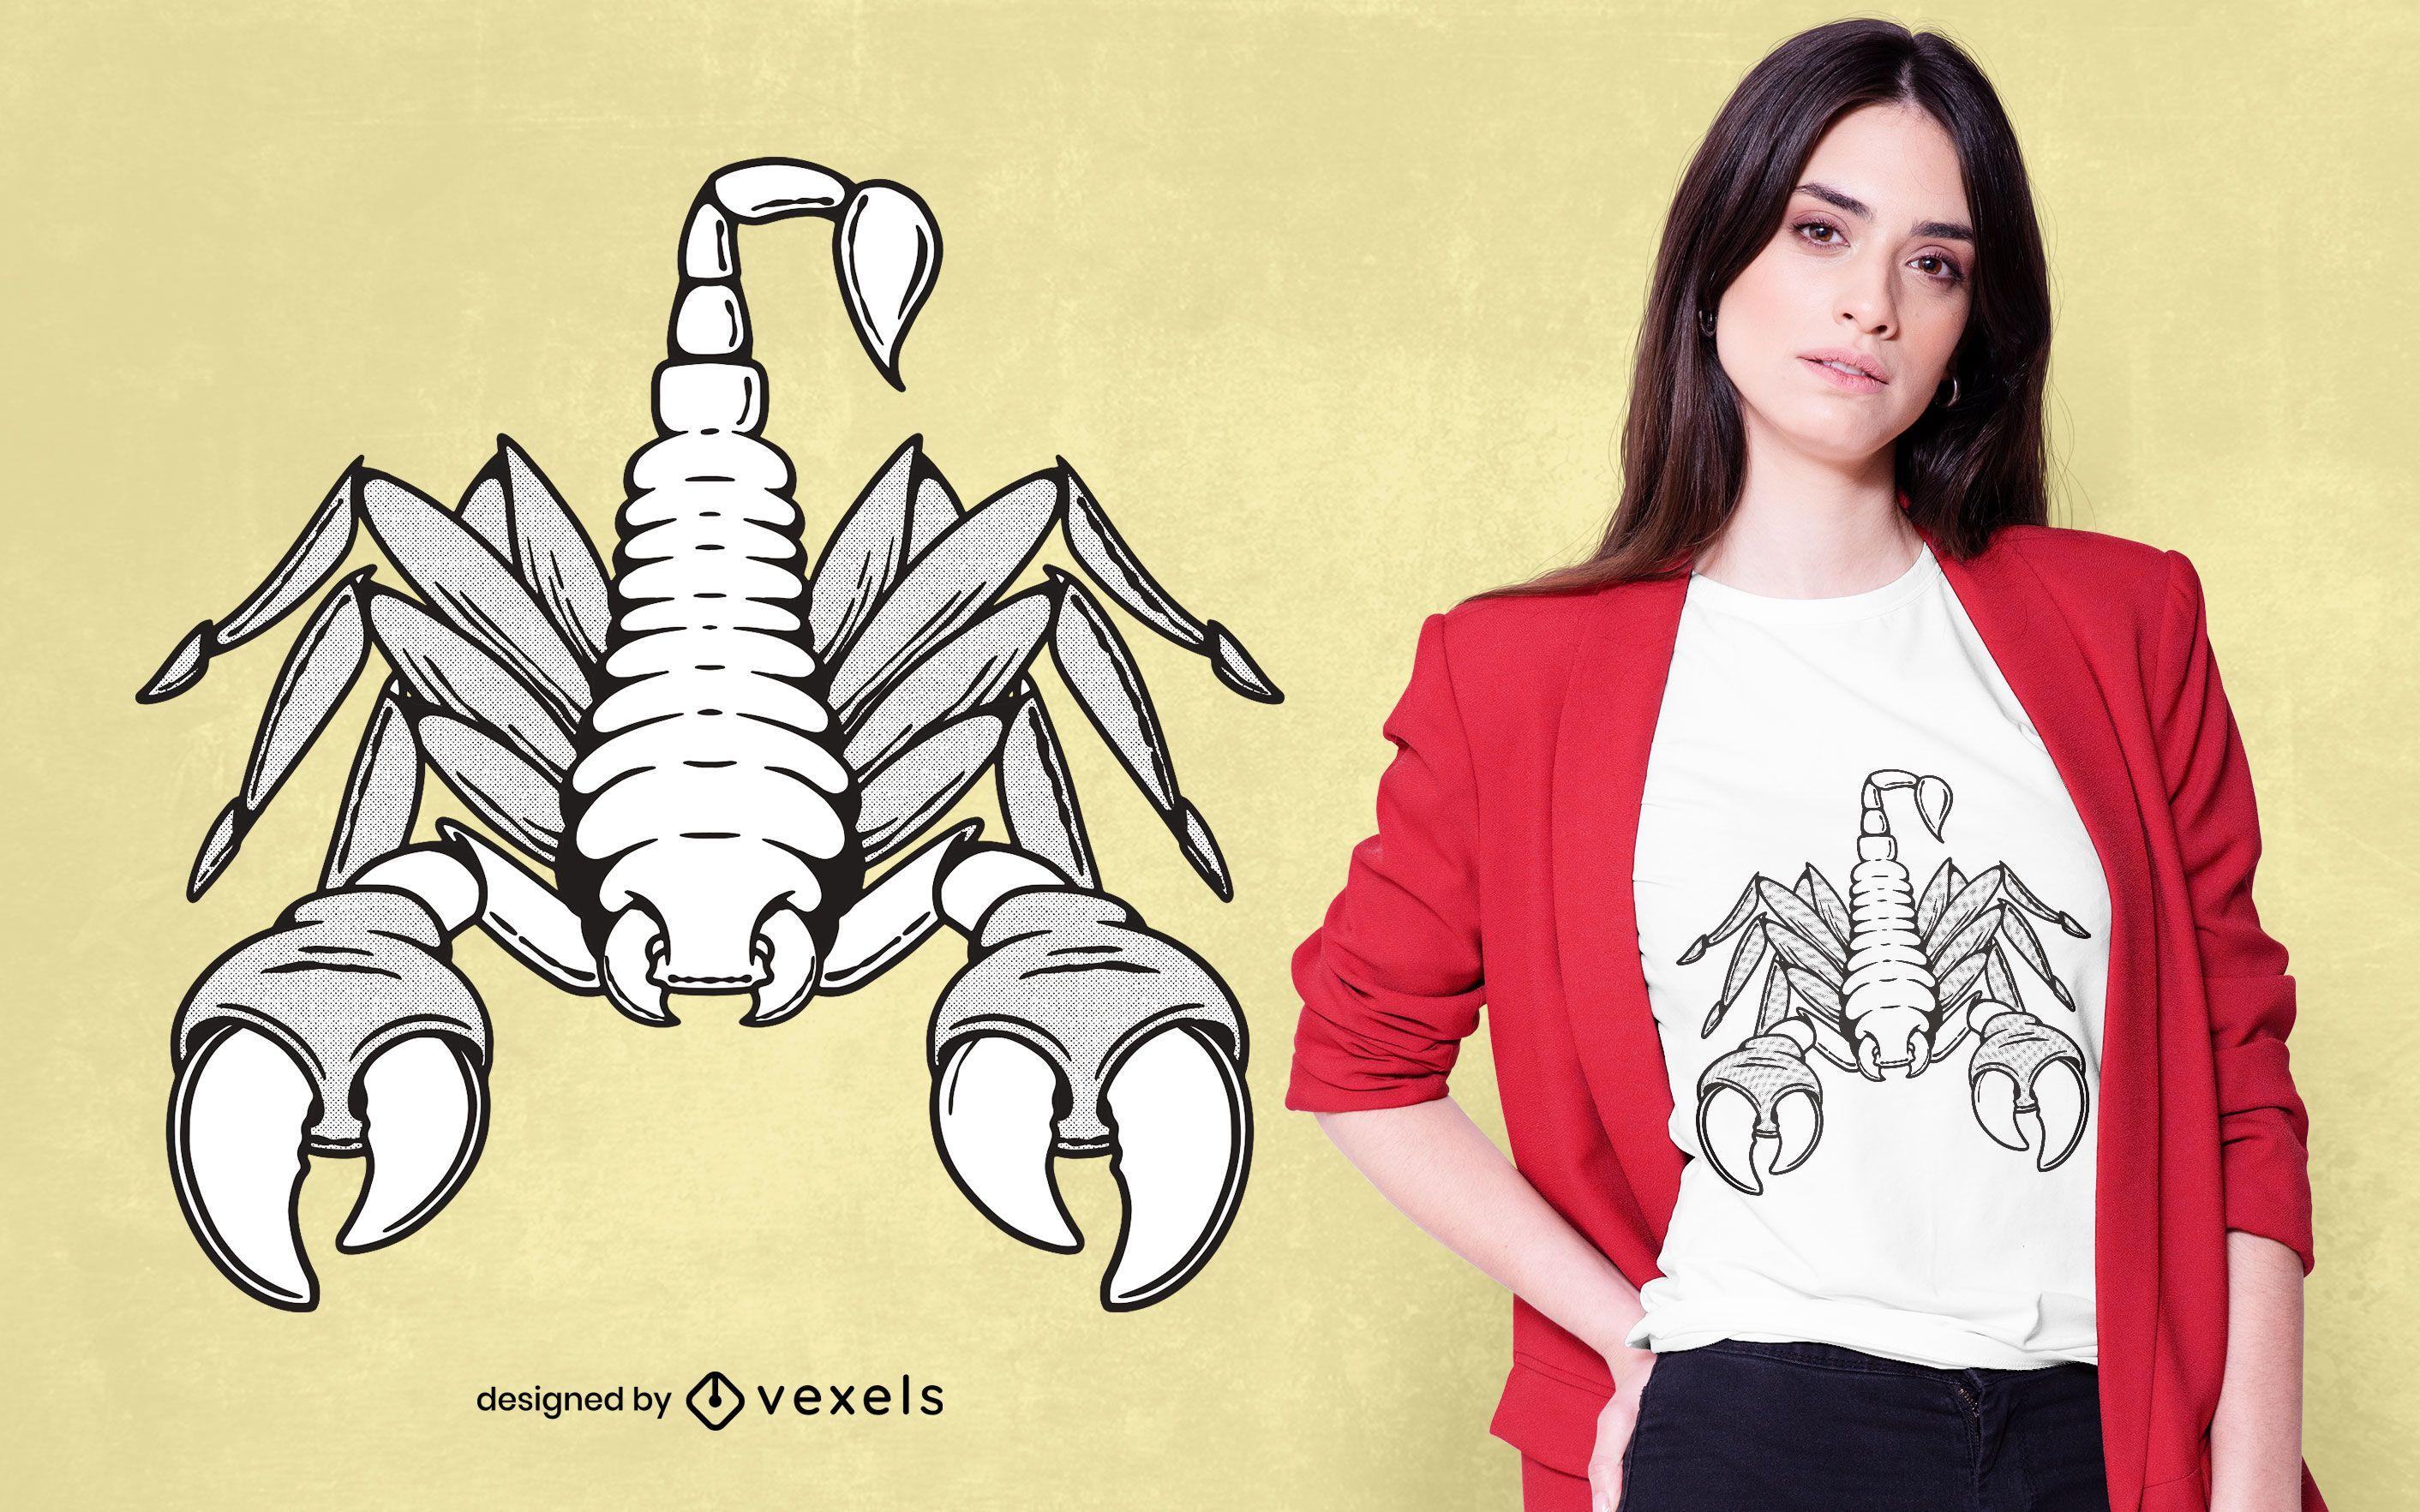 Black and white scorpion t-shirt design